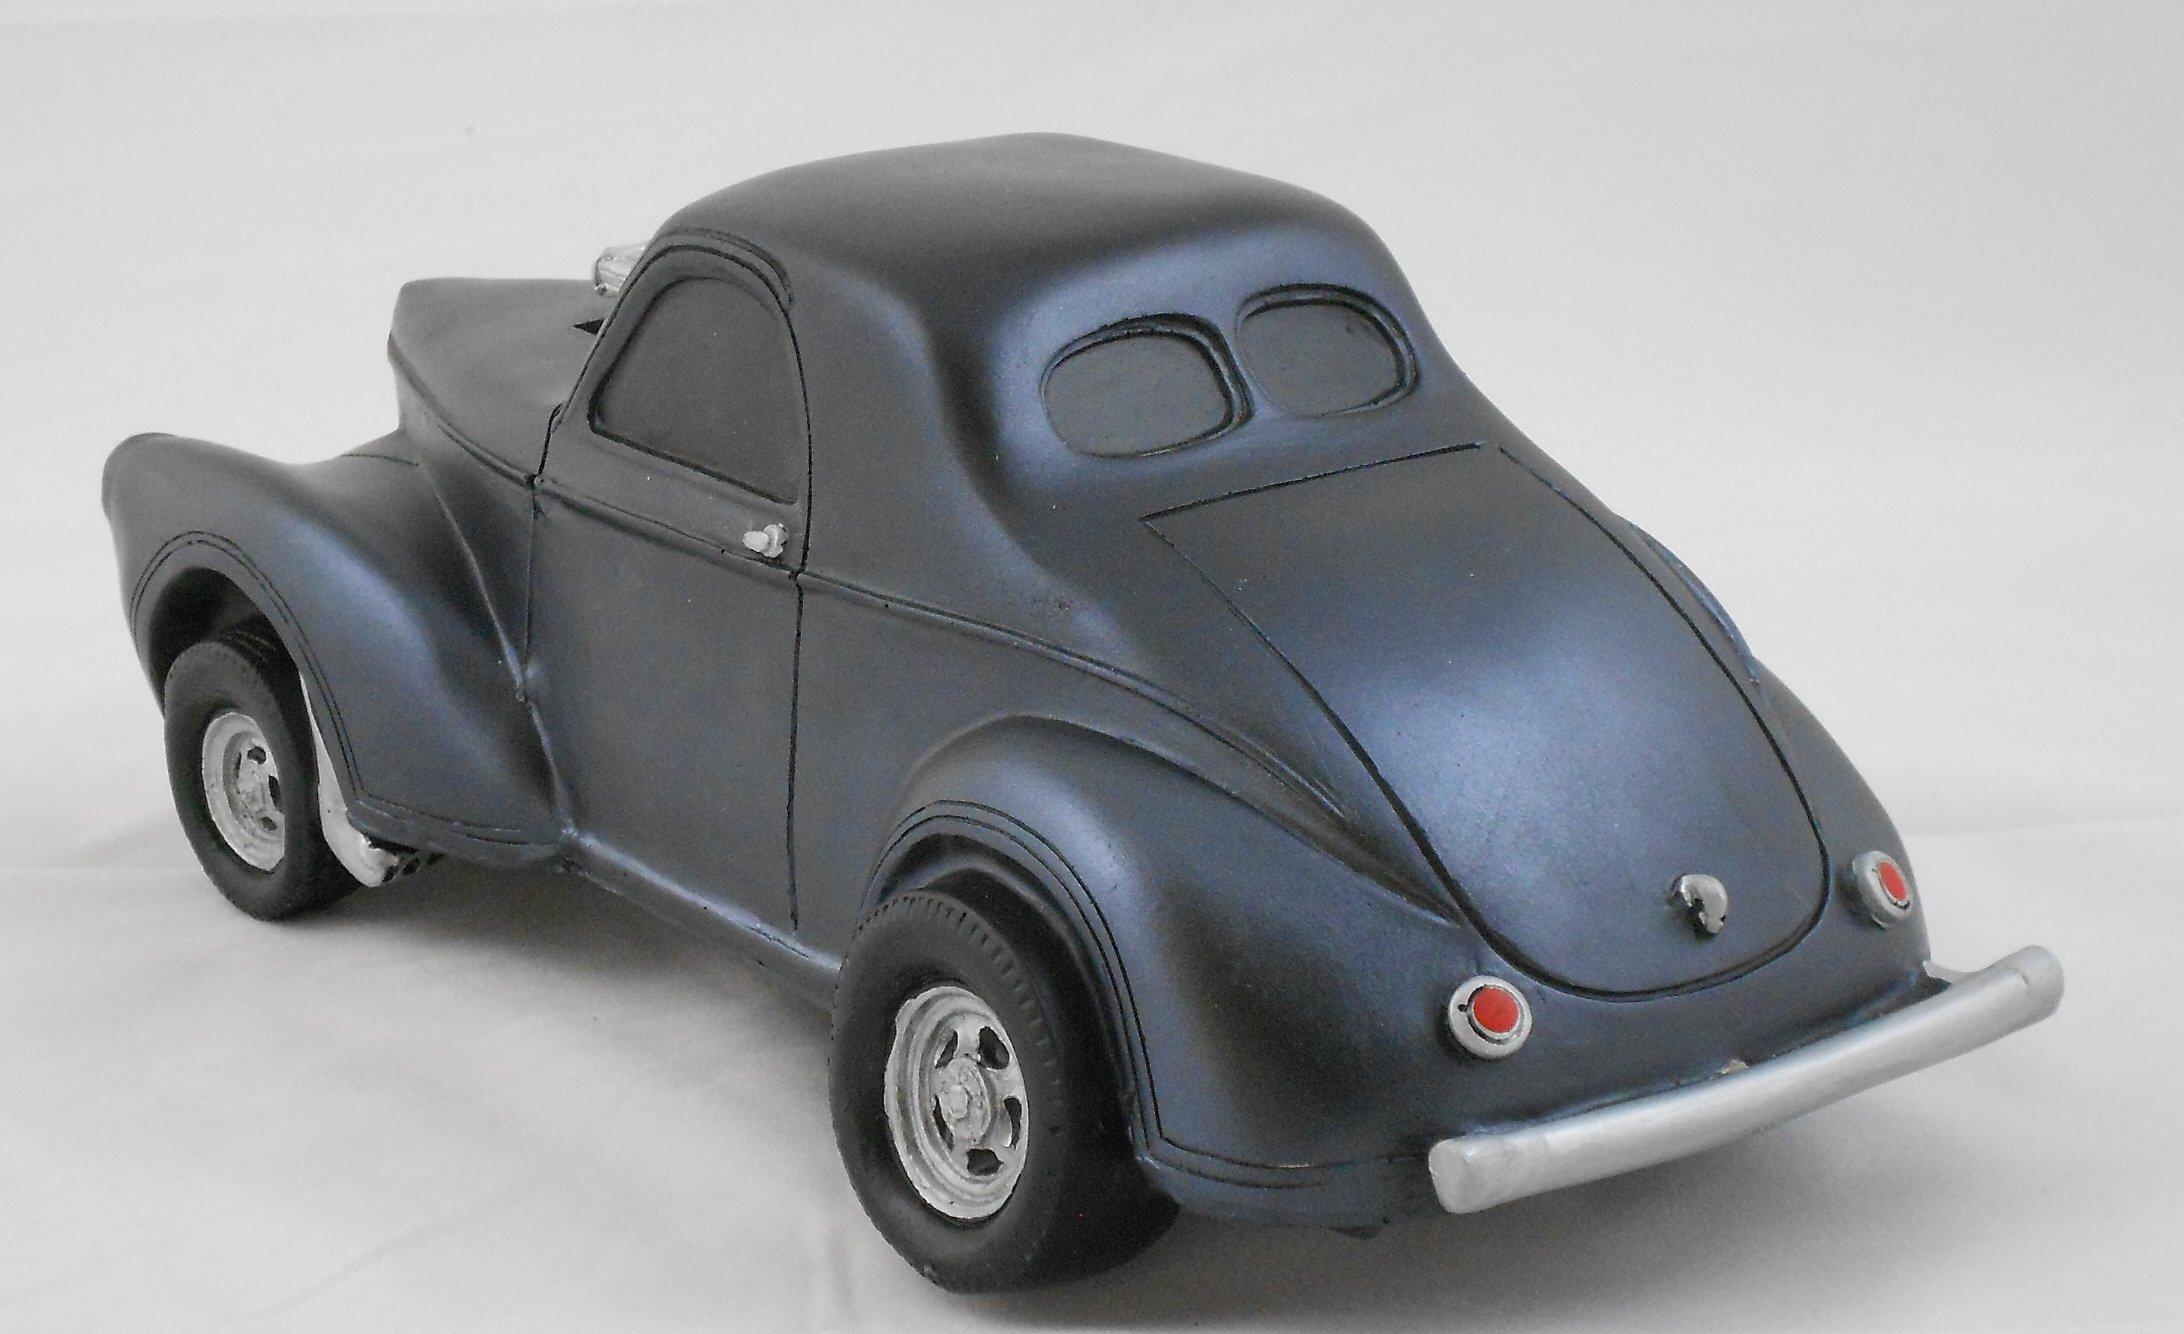 Gasser Model 1941 Willys 1:18 Scale Black by Gasser Models (Image #2)